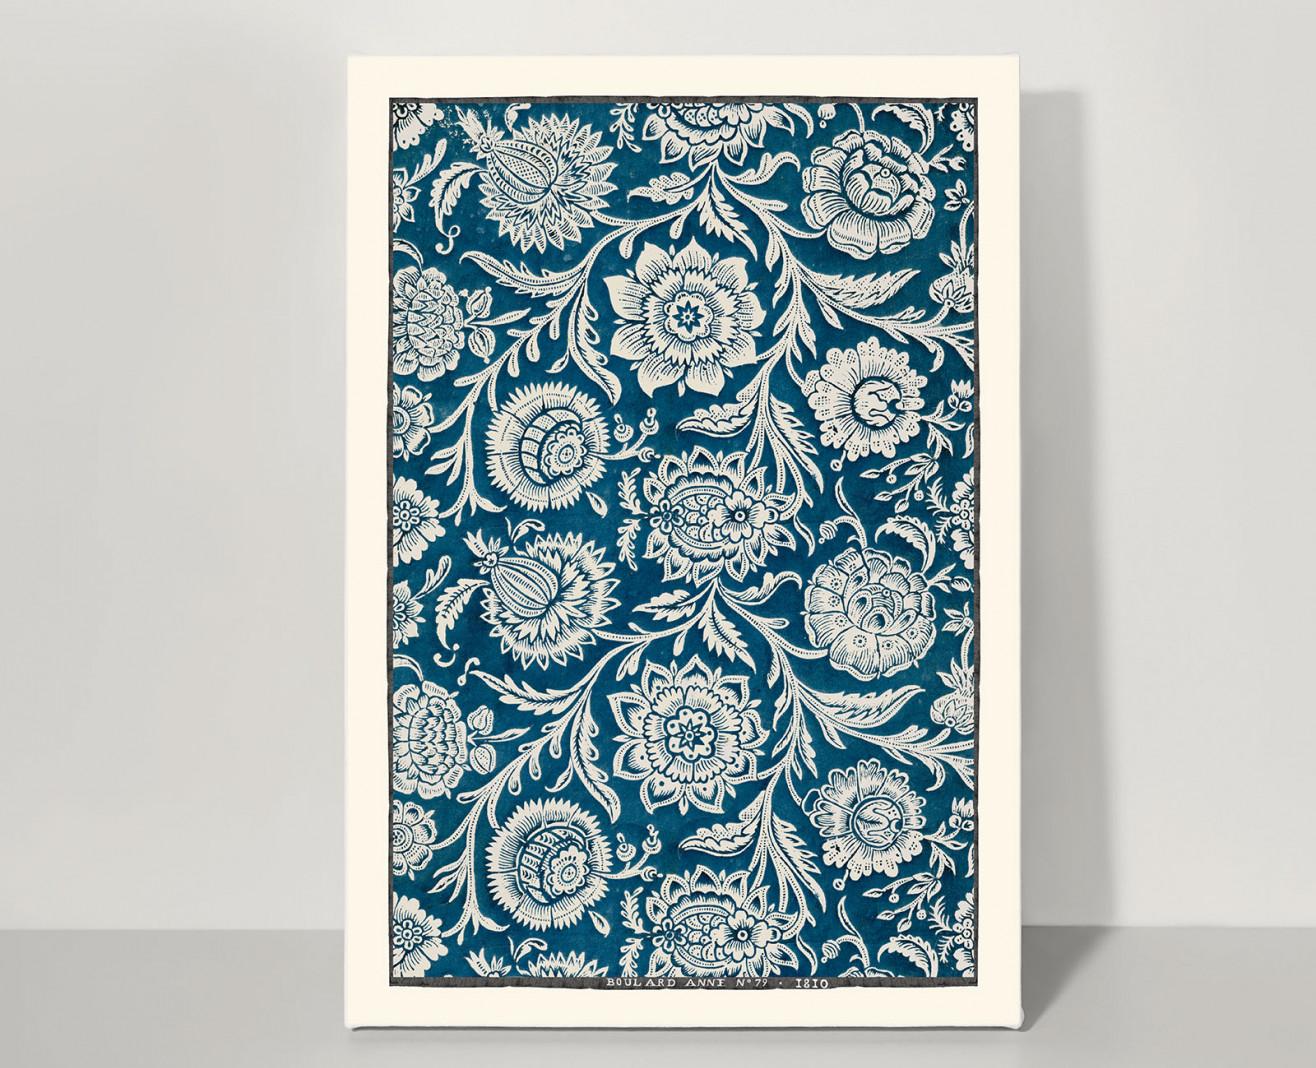 Domino board picock blue peonies A3 . 1810